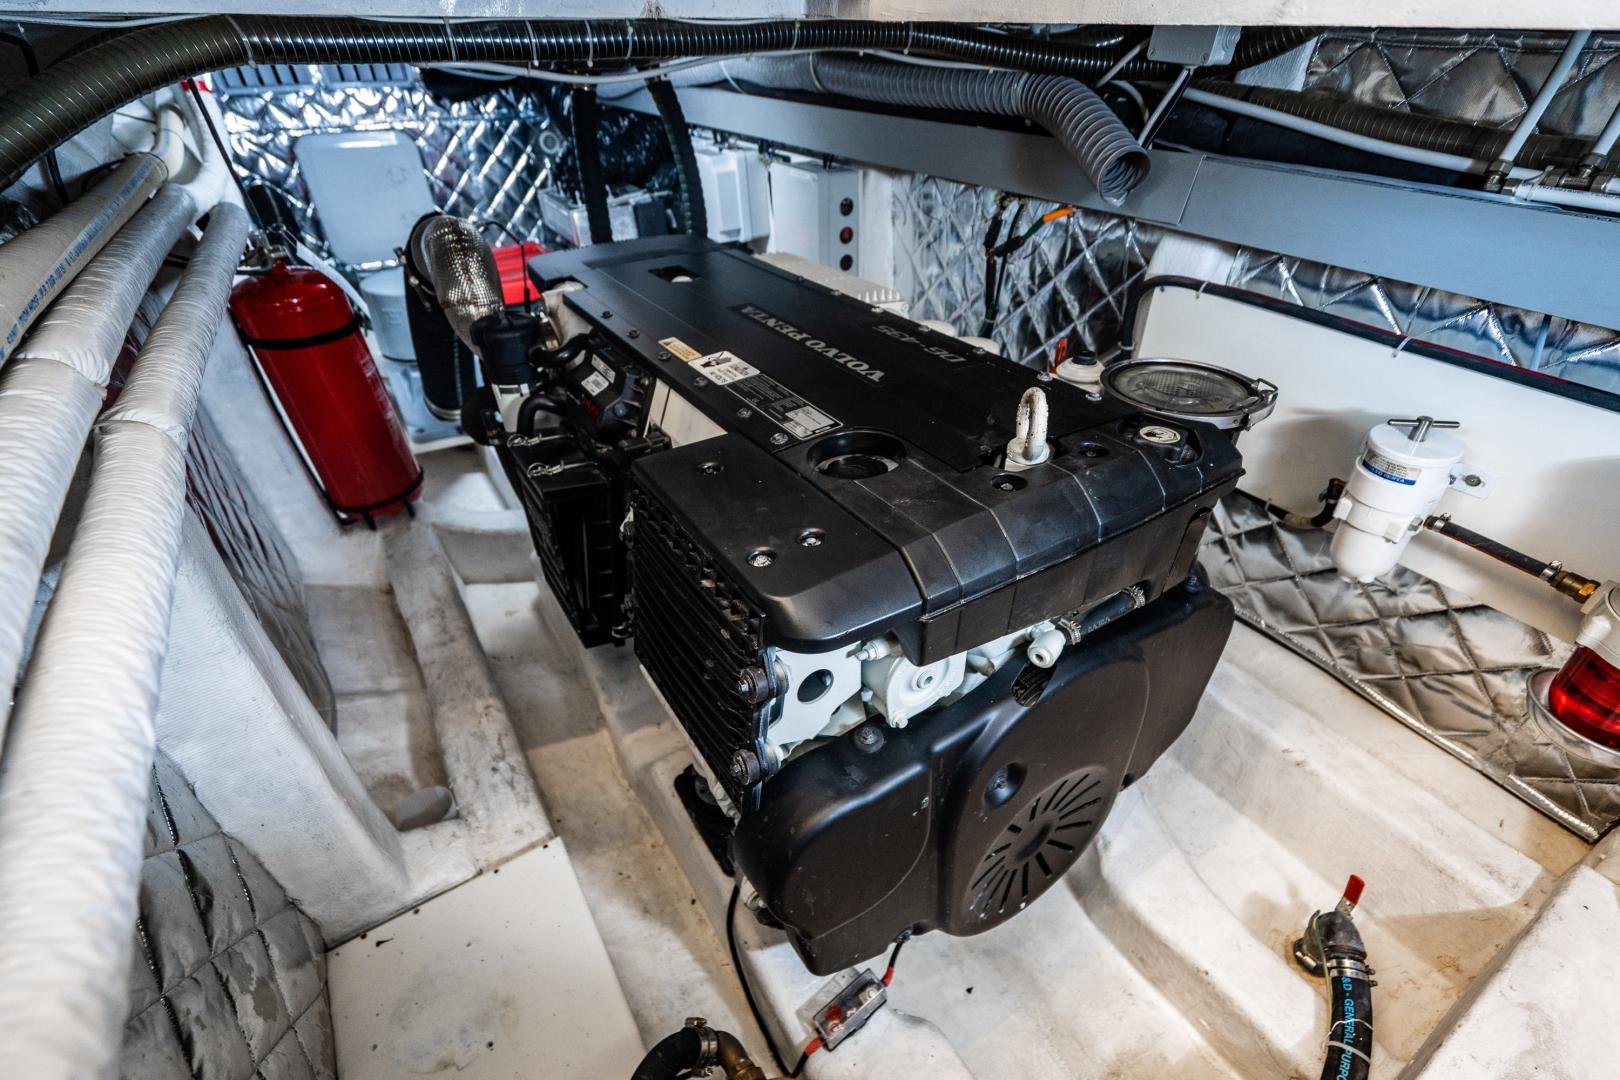 Overblue-58 Power Catamaran 2017-Techuila Ft. Lauderdale-Florida-United States-2017 Overblue 58 Powercat Engine Room-1401273   Thumbnail